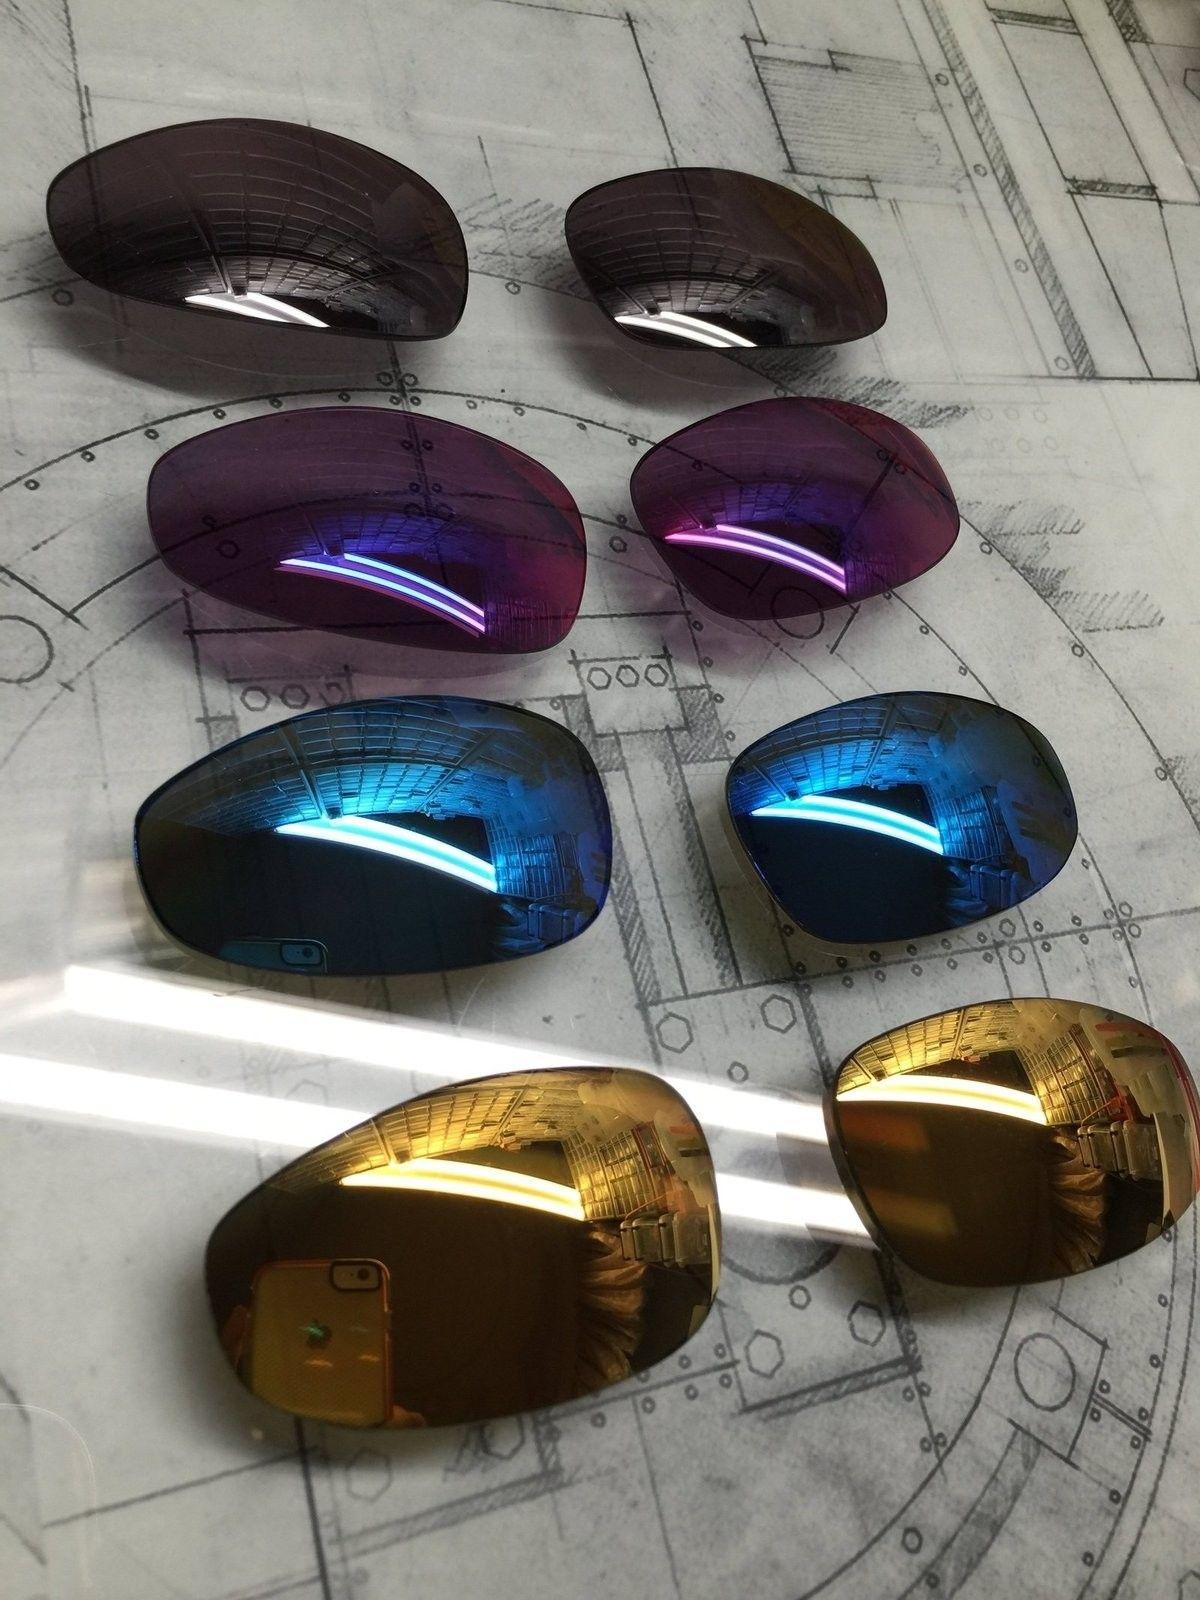 Custom cut lenses with @Chris A Hardaway - image.jpeg